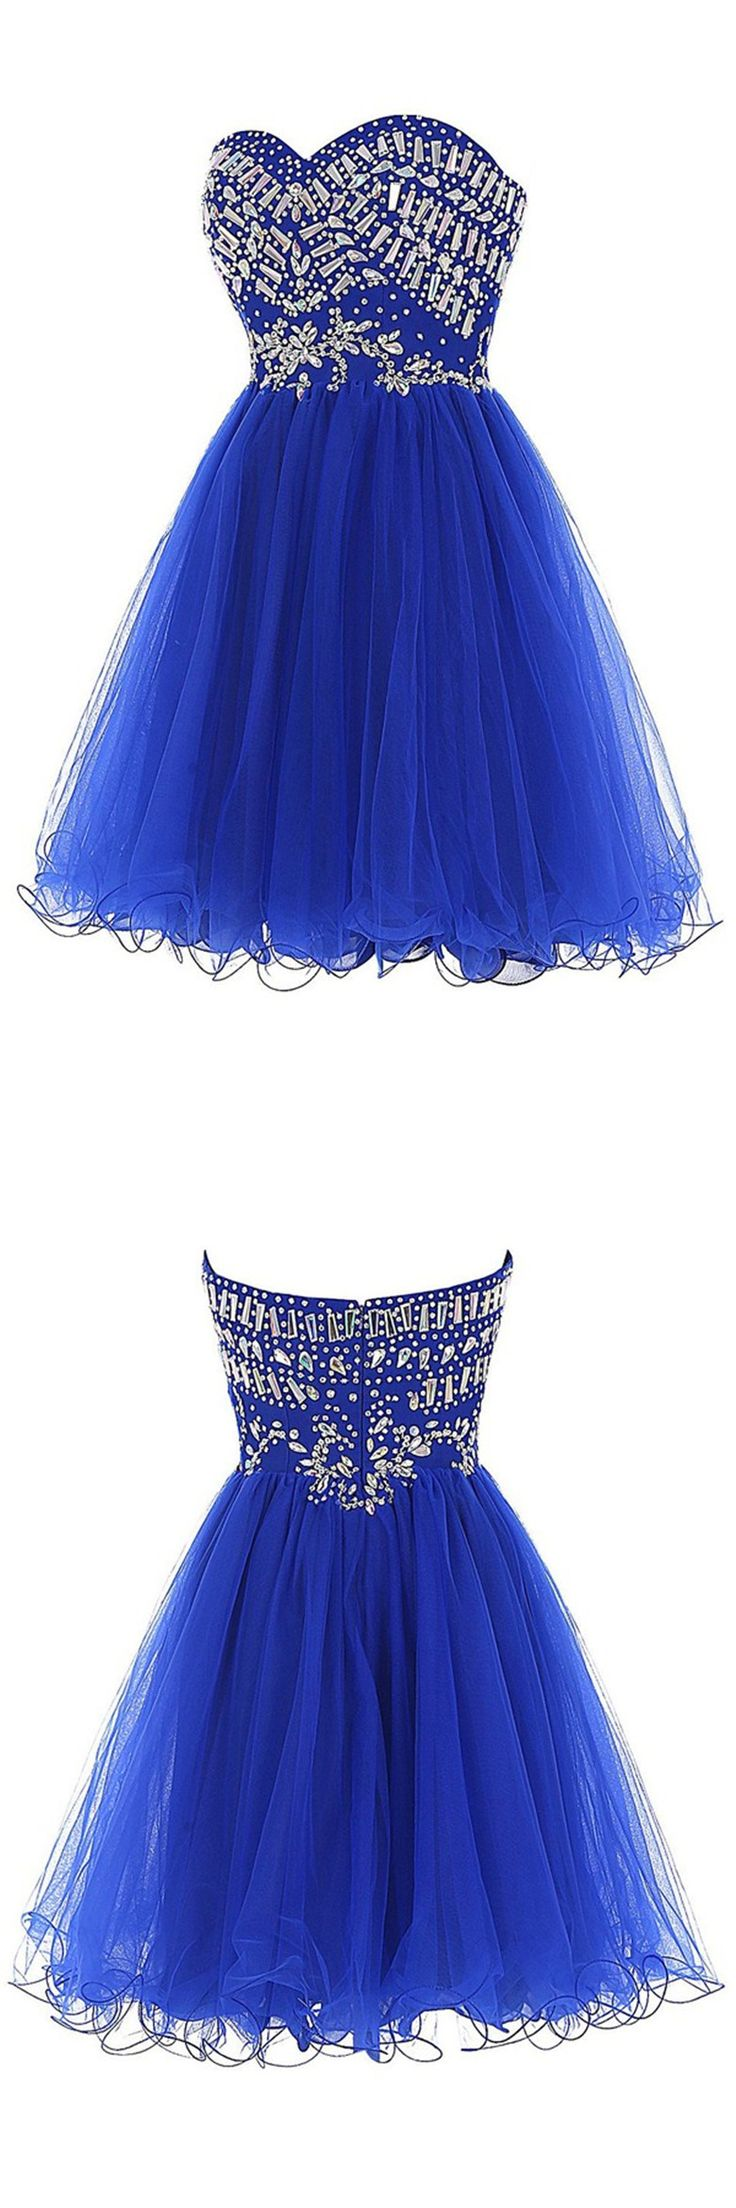 homecoming dress,royal blue homecoming dress,simple a-line homecoming…